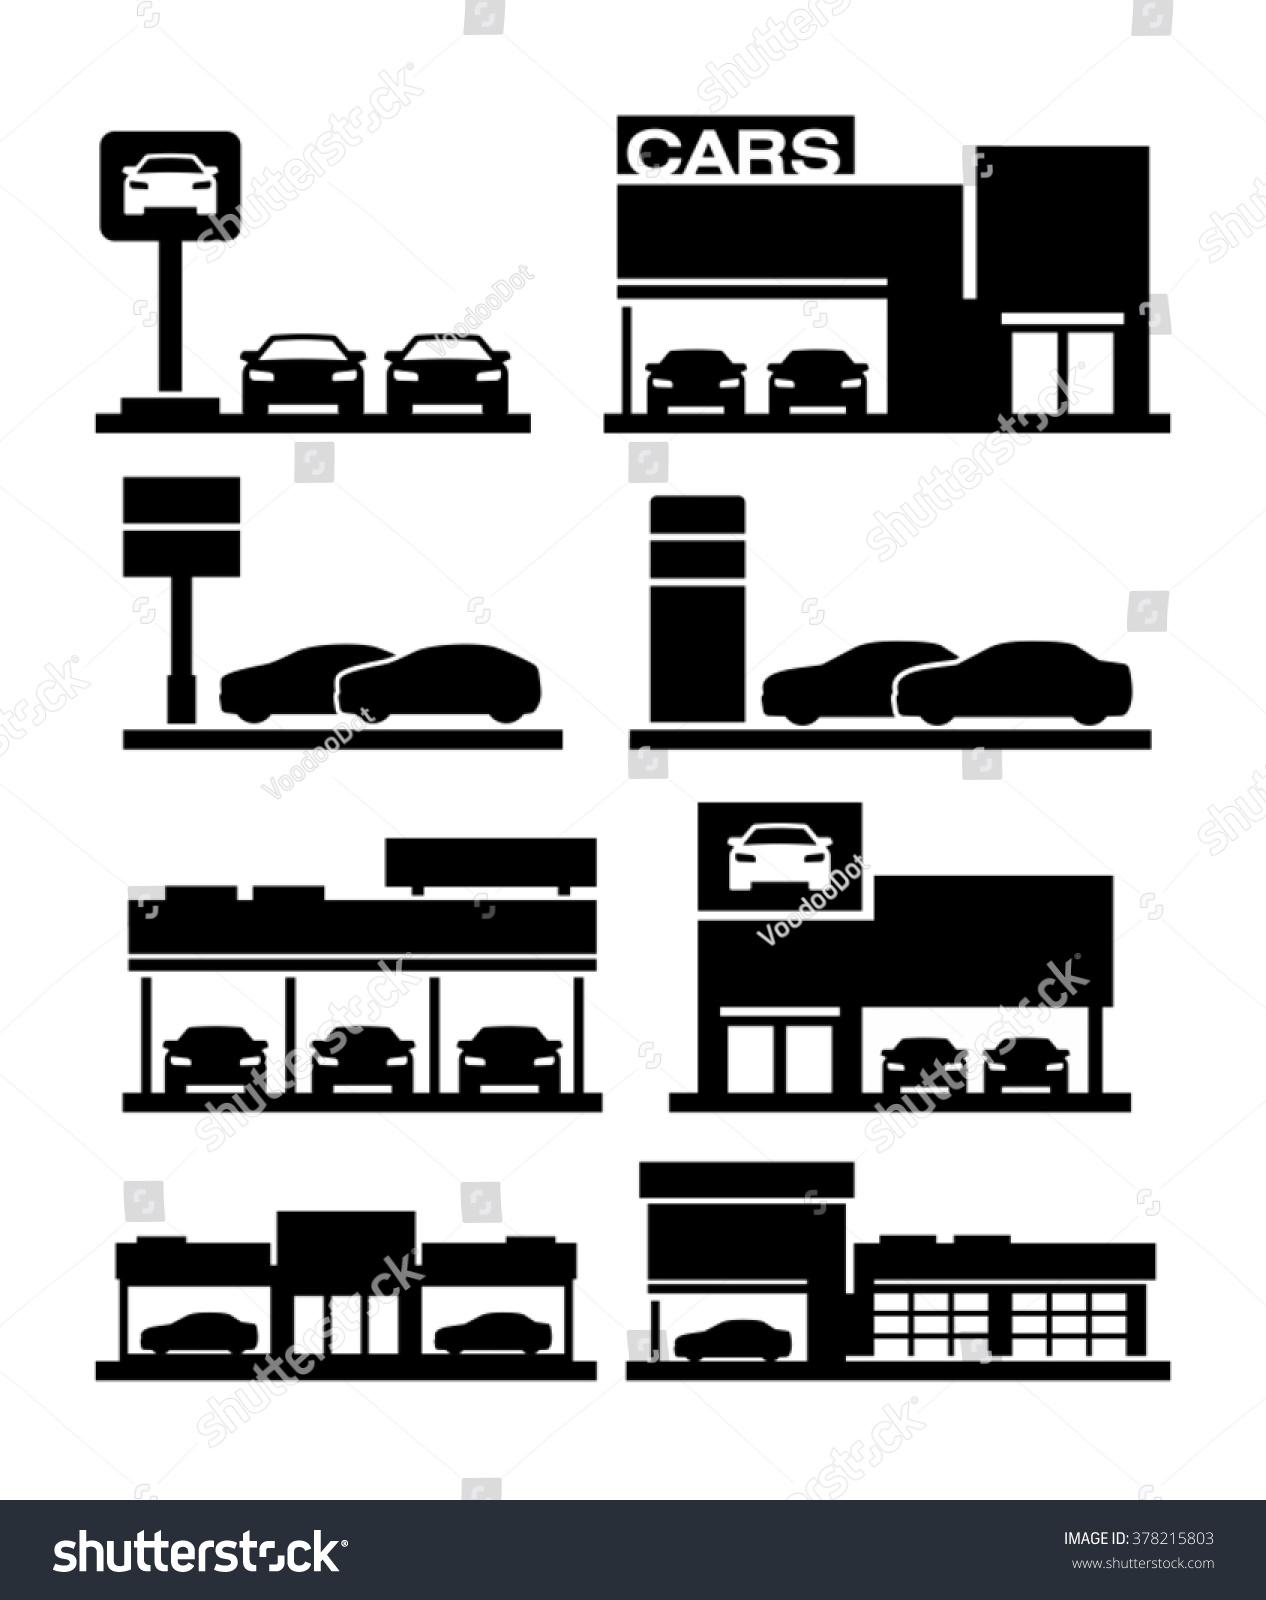 clipart car dealership - photo #27